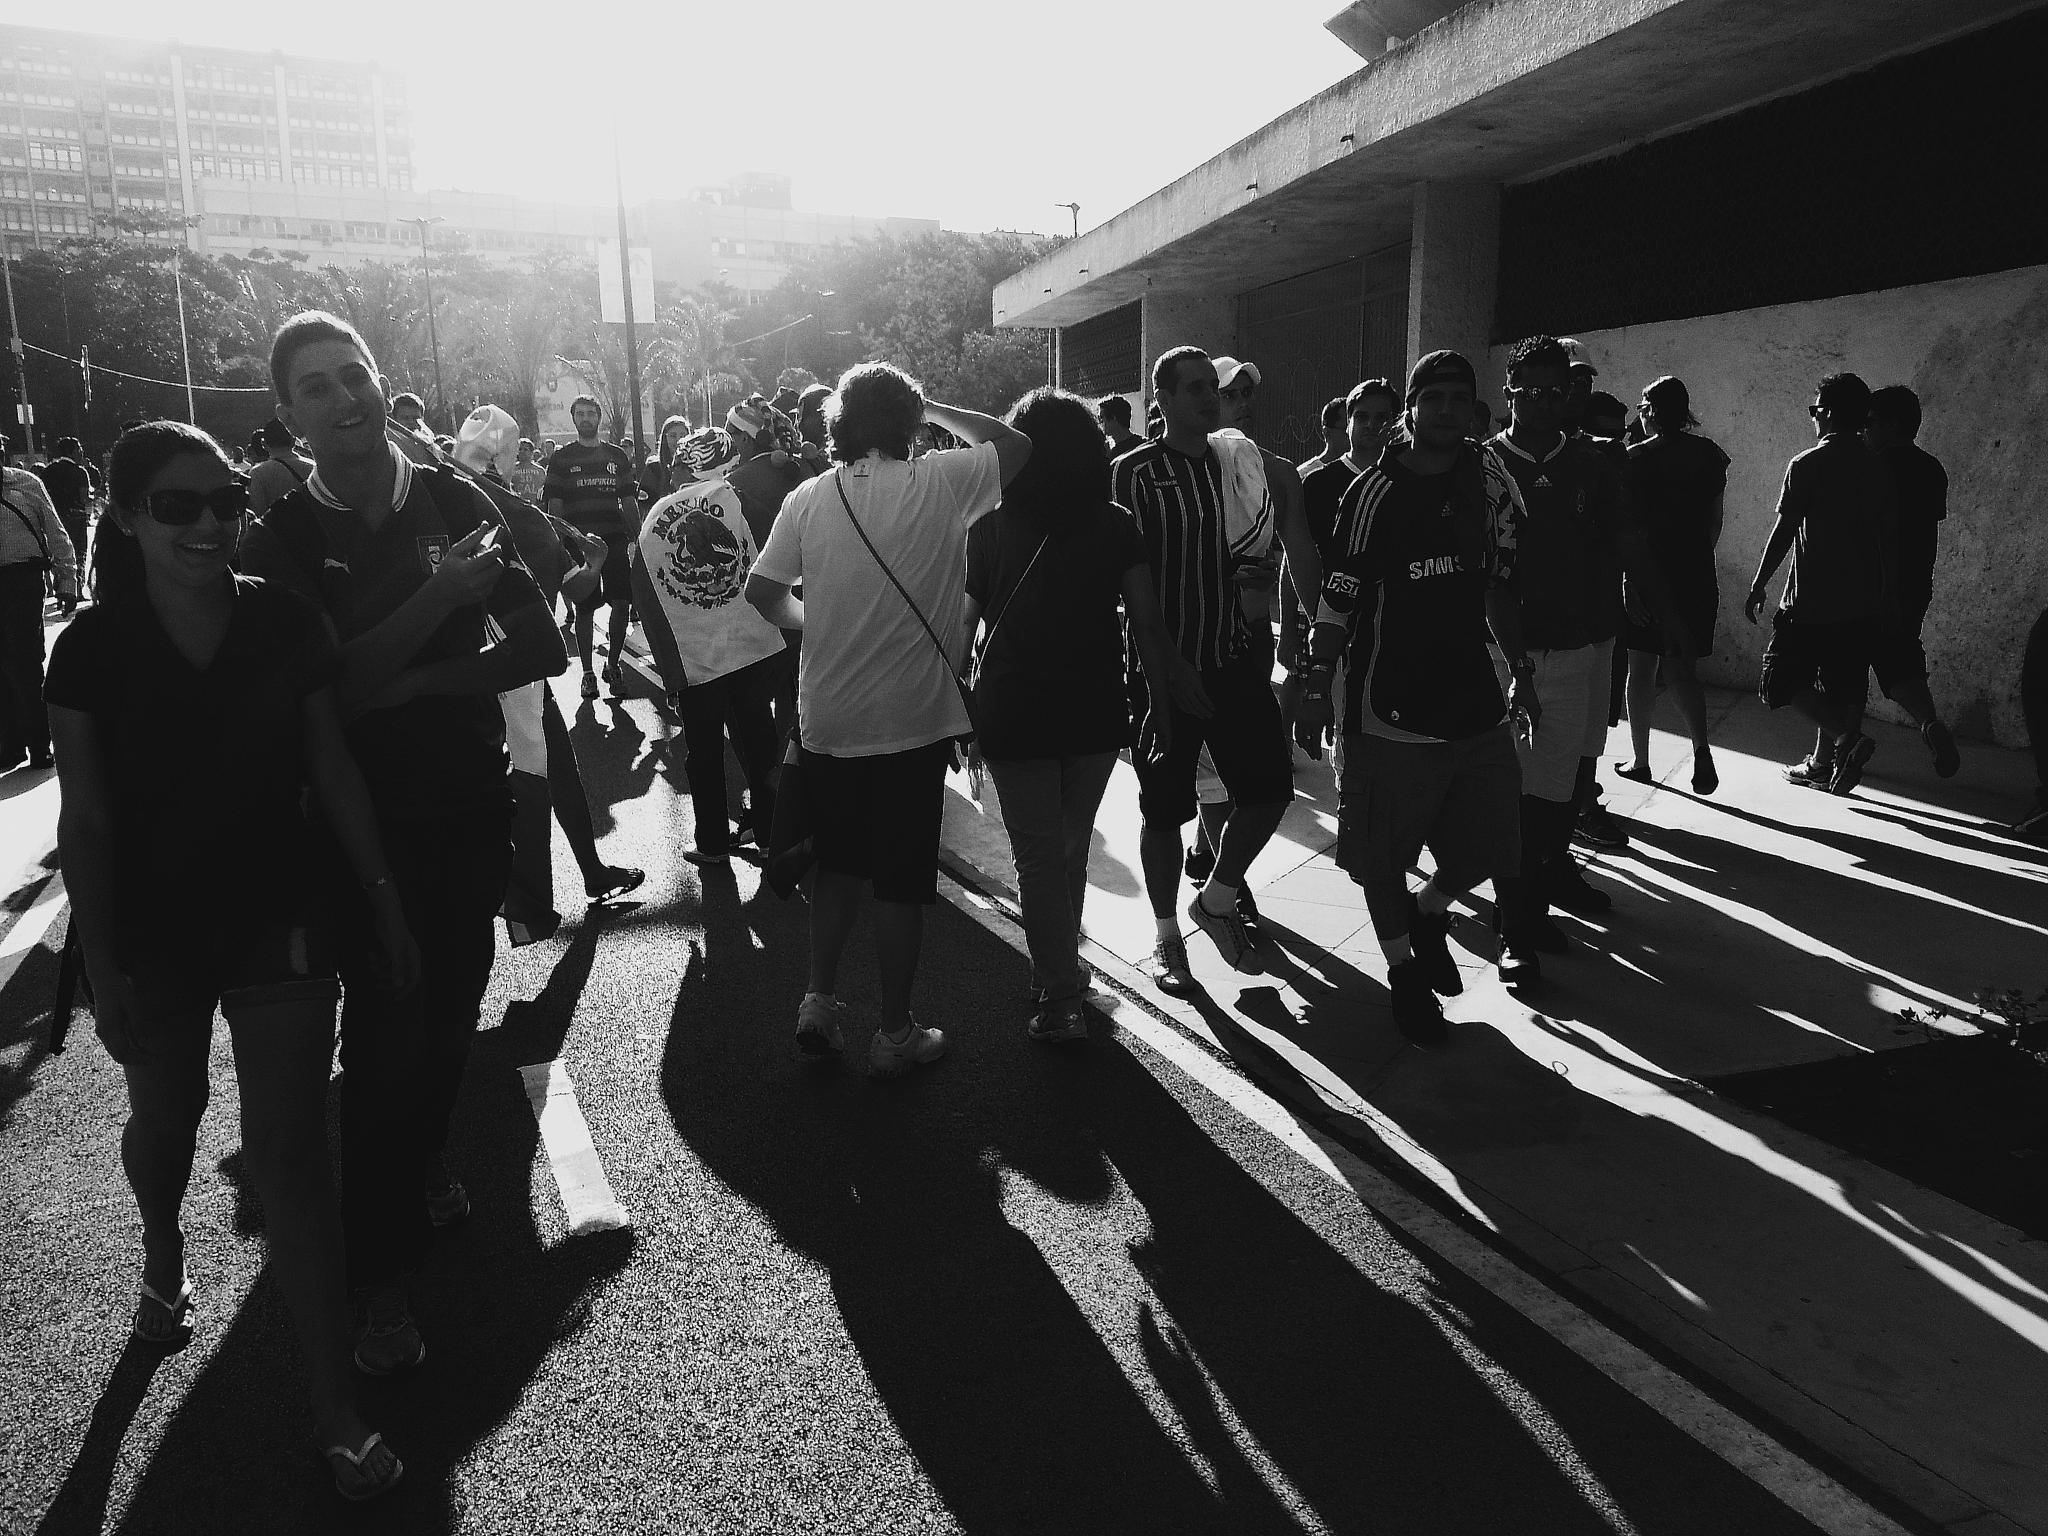 In front of the Stadium by Honorio Carlos Pereira Braga